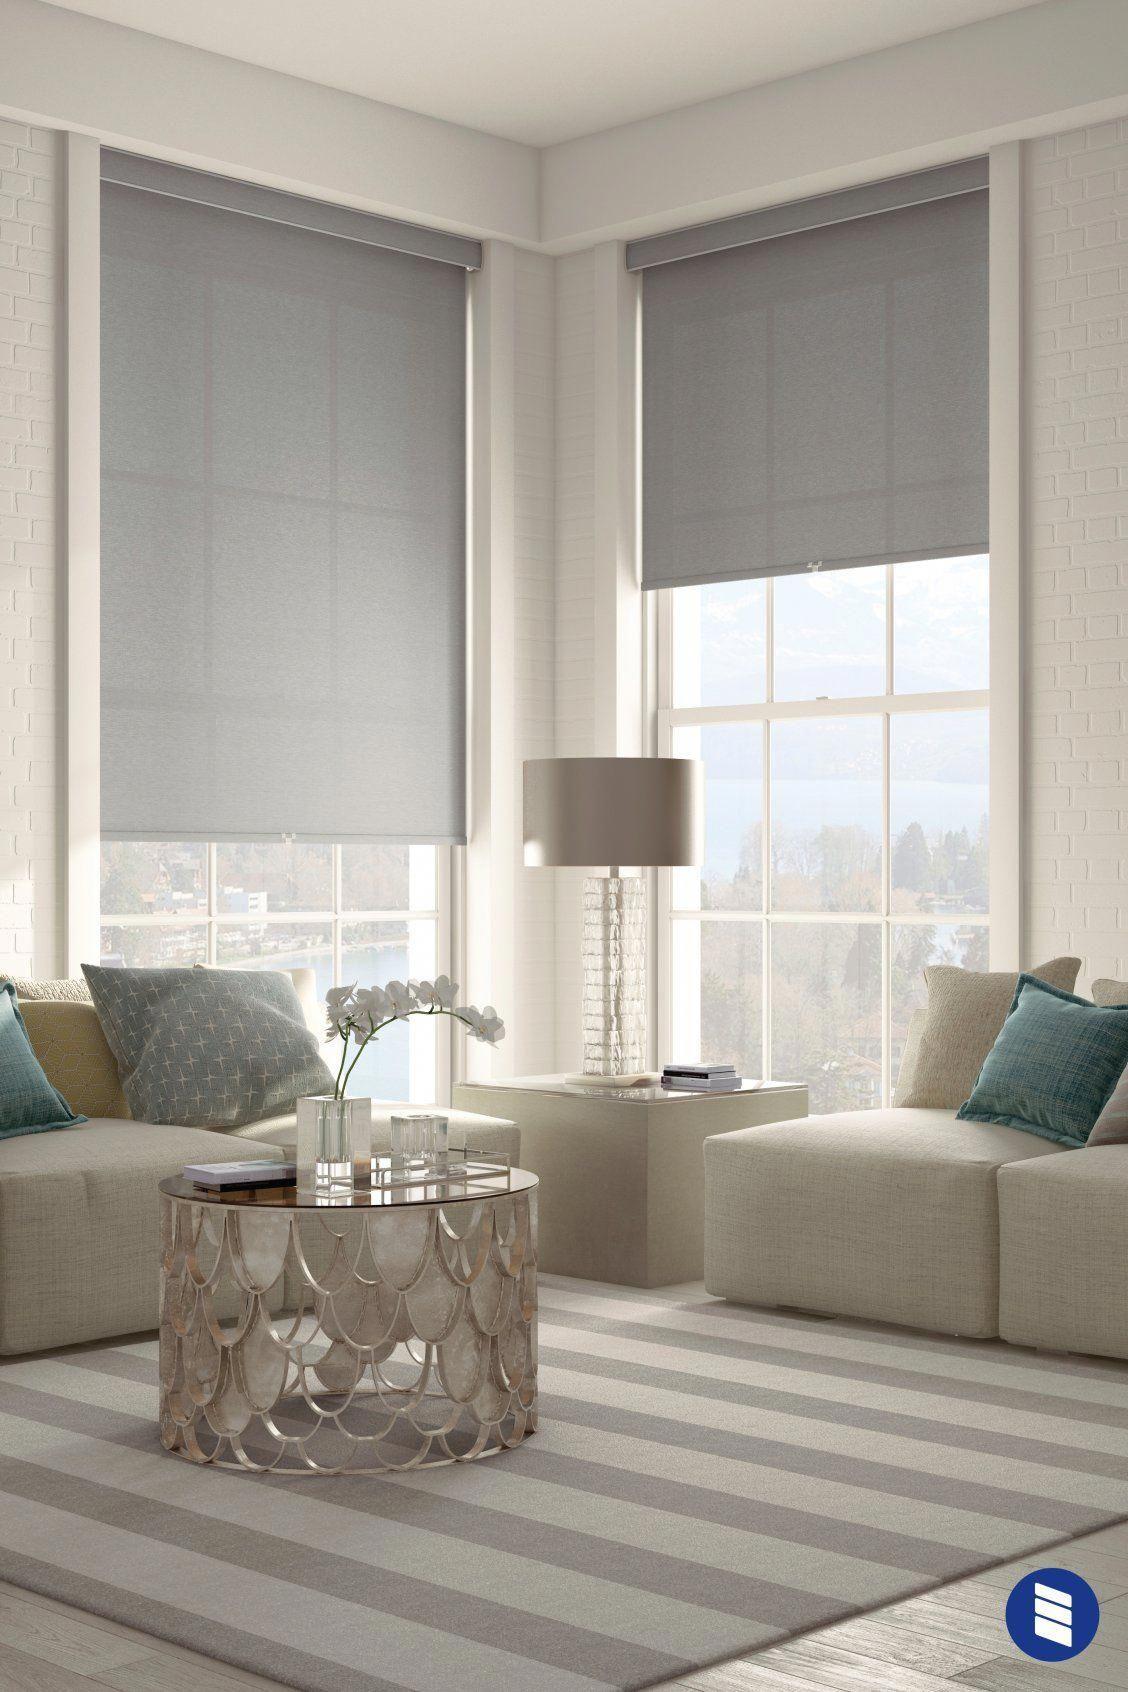 Levolor Solar Roller Shades Blinds Com Window Treatments Living Room Living Room Blinds Living Room Windows #wood #blinds #in #living #room